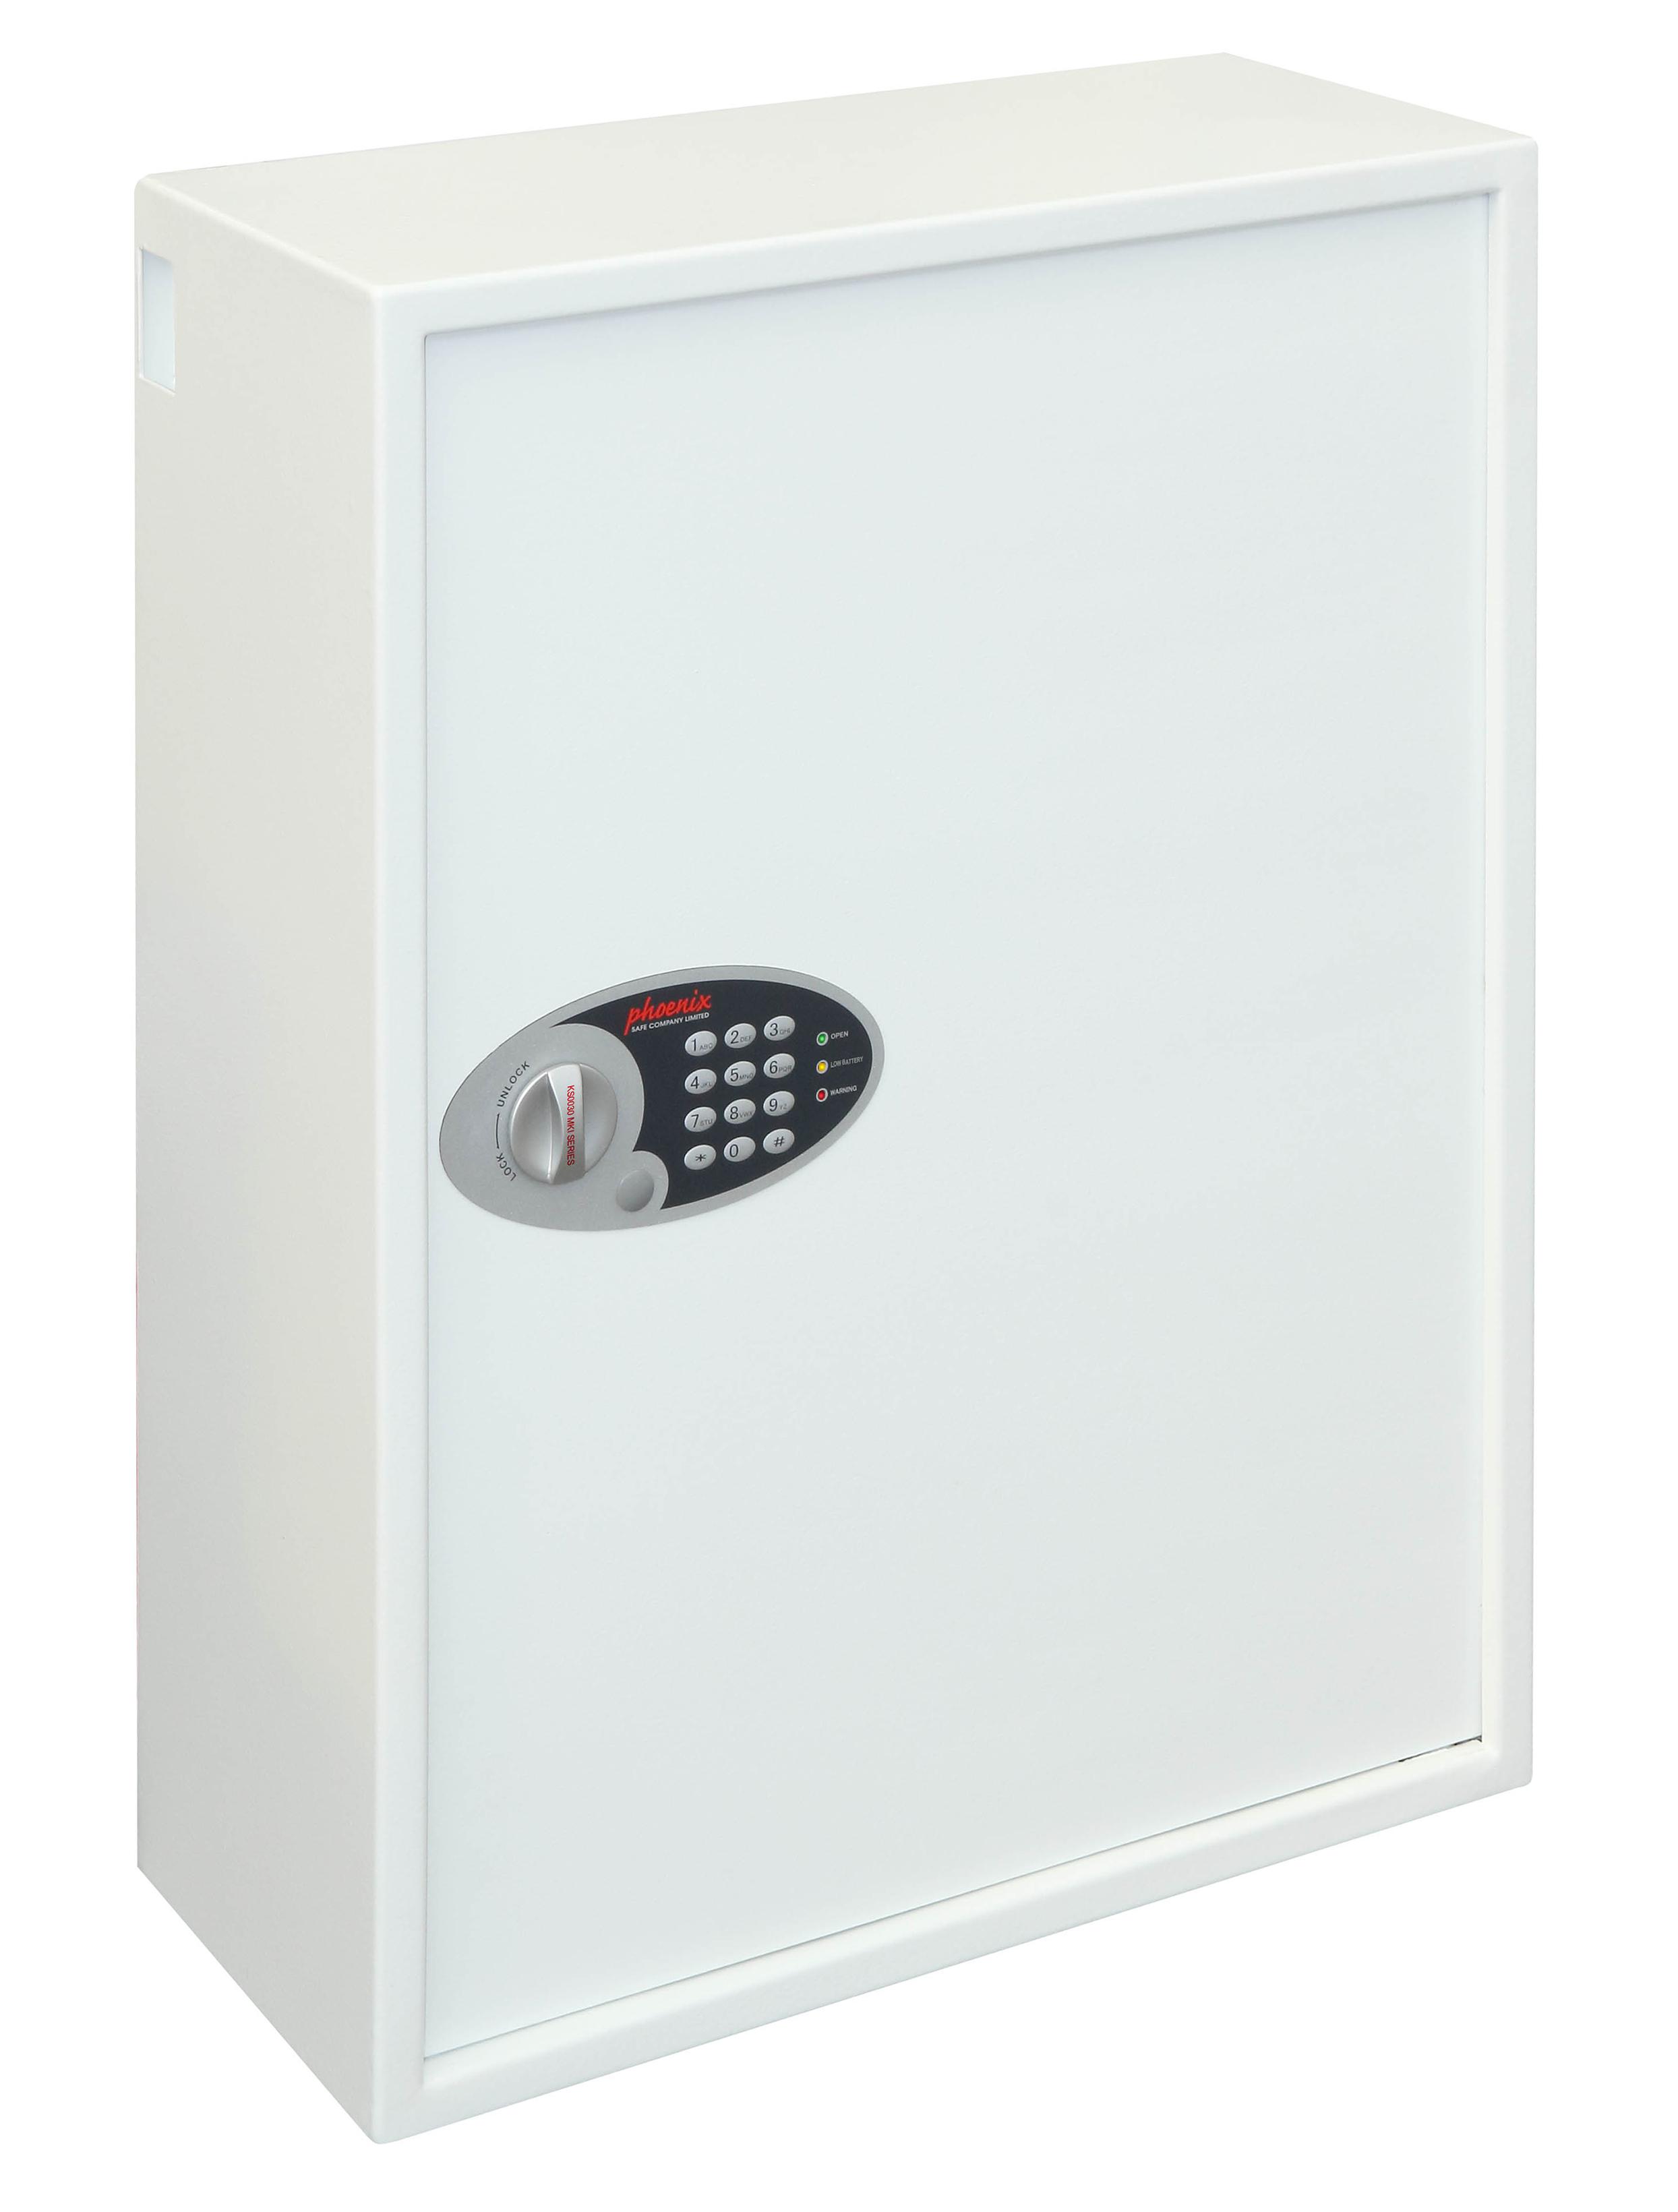 Key Store Phoenix Cygnus Key Deposit Safe 700 Hook Electronic Lck